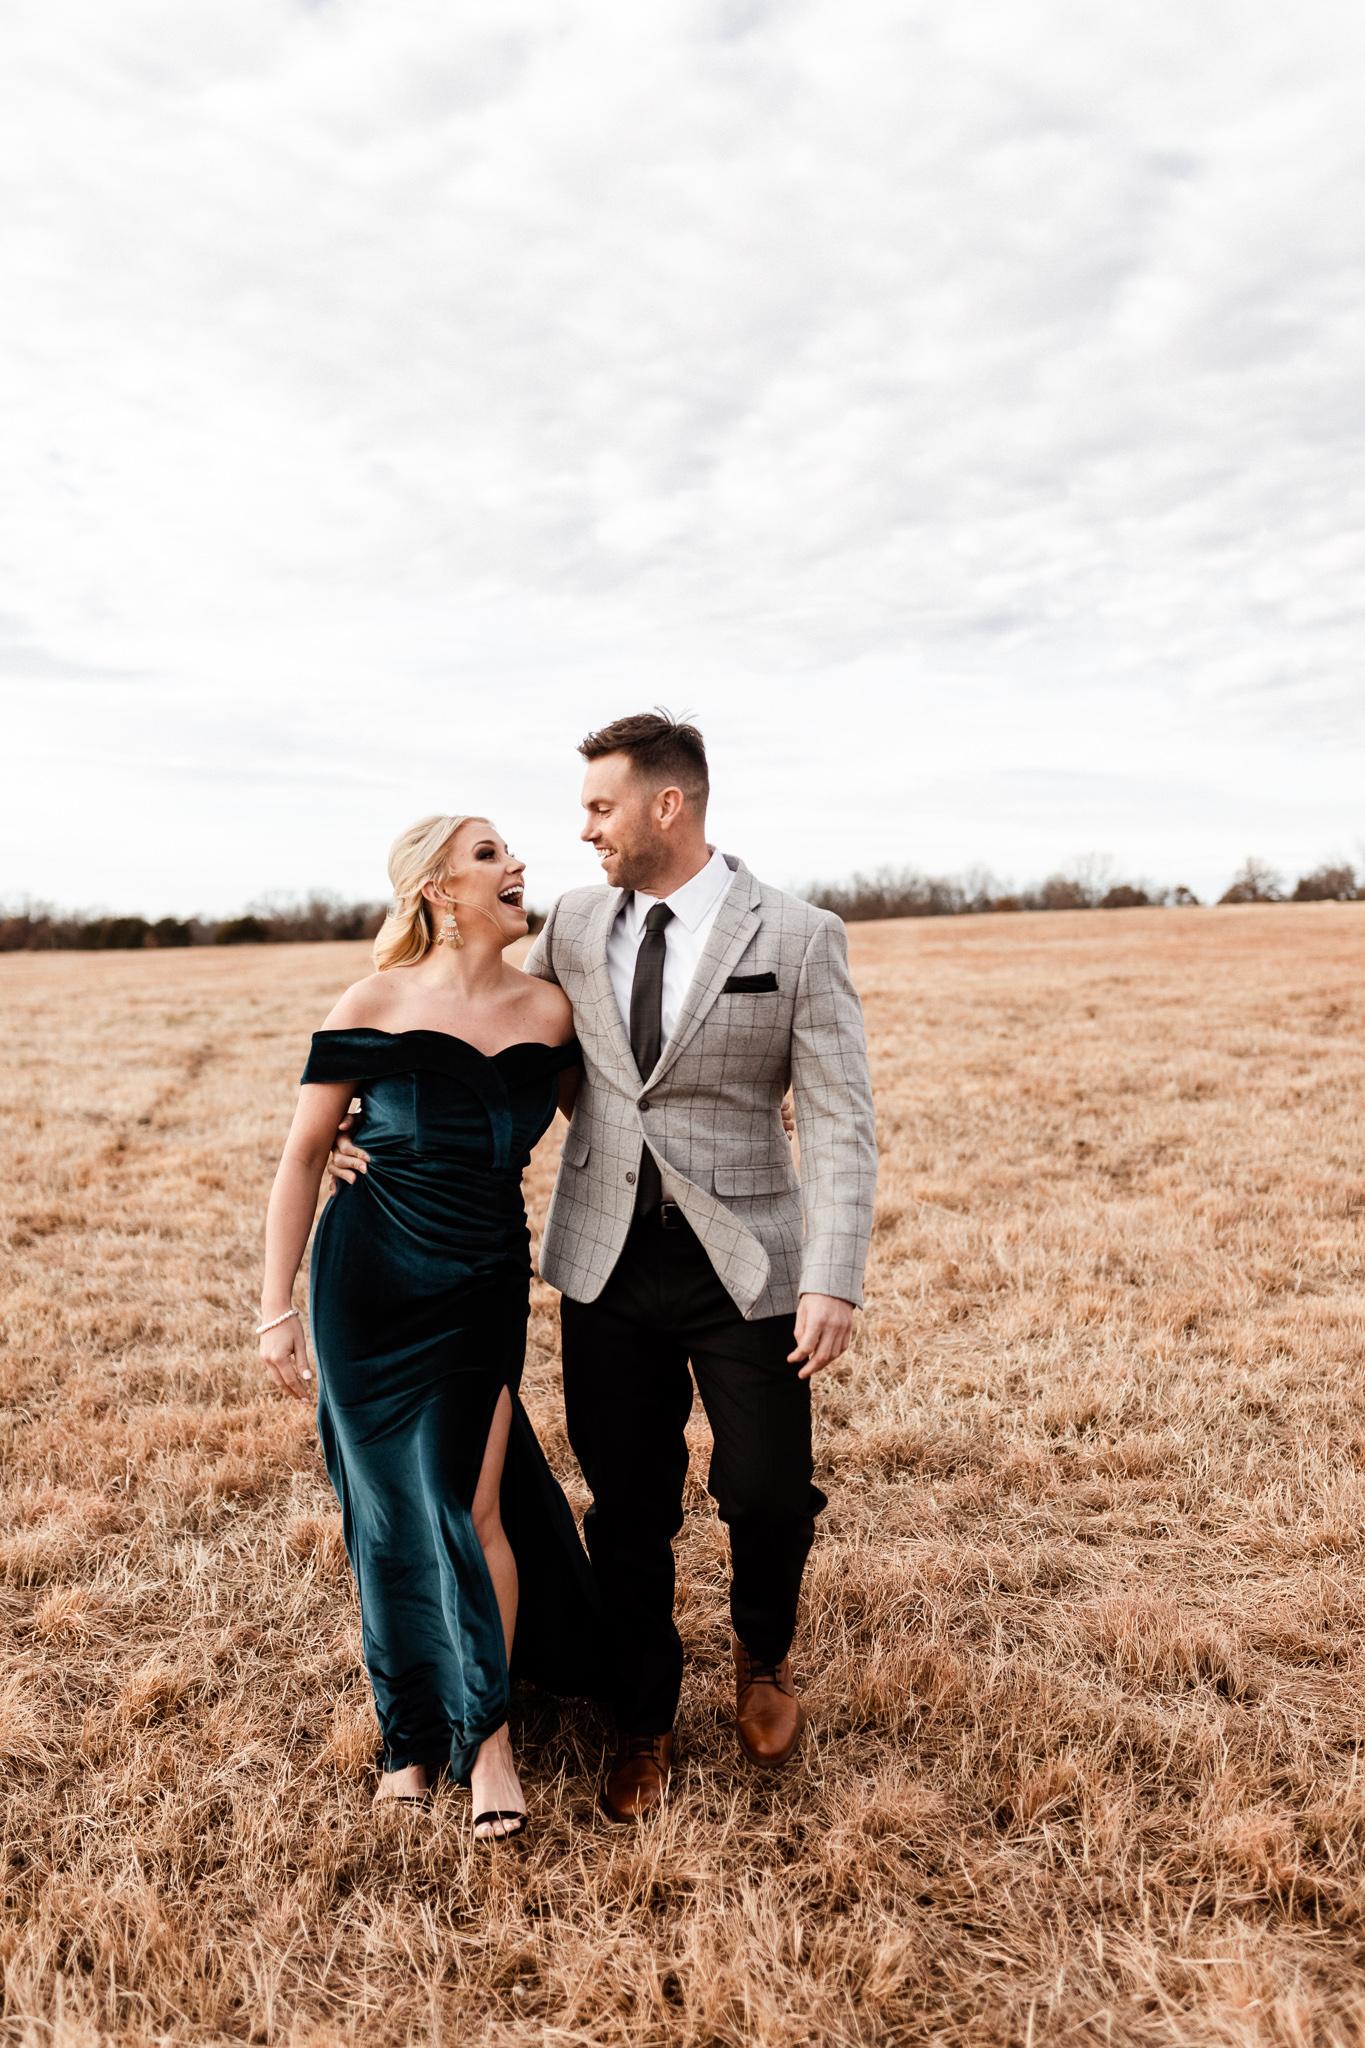 Wade + Stephanie | Warm Open Field Engagements | Oklahoma Wedding Photographer-21.jpg